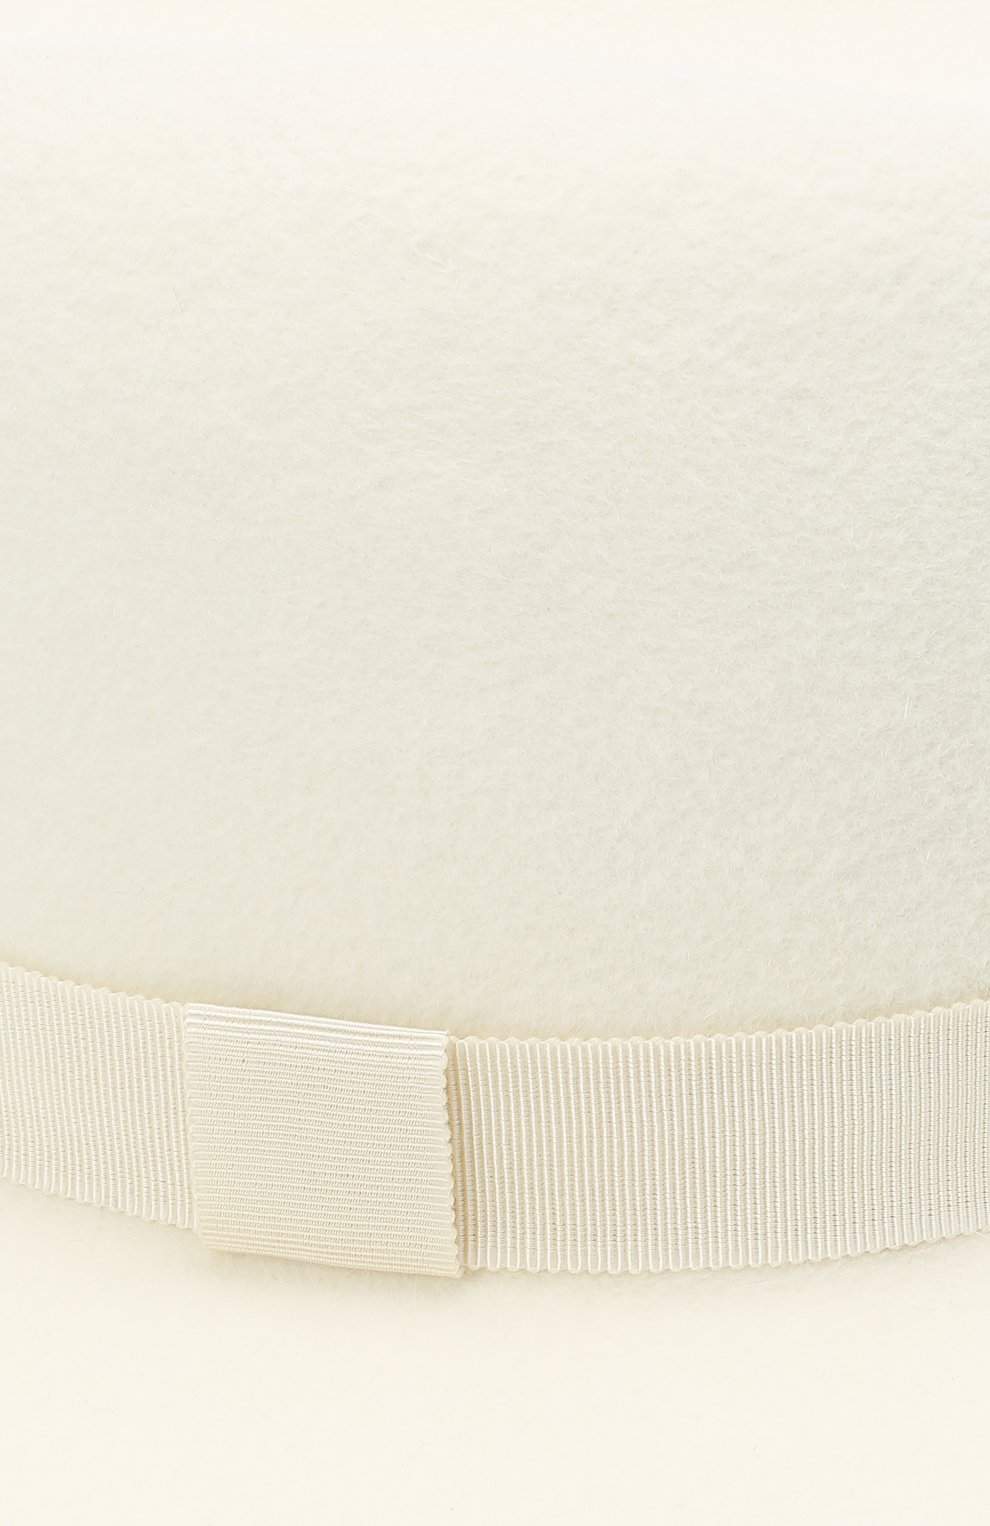 Женская шляпа london COCOSHNICK HEADDRESS белого цвета, арт. londonl-01 | Фото 3 (Материал: Текстиль)